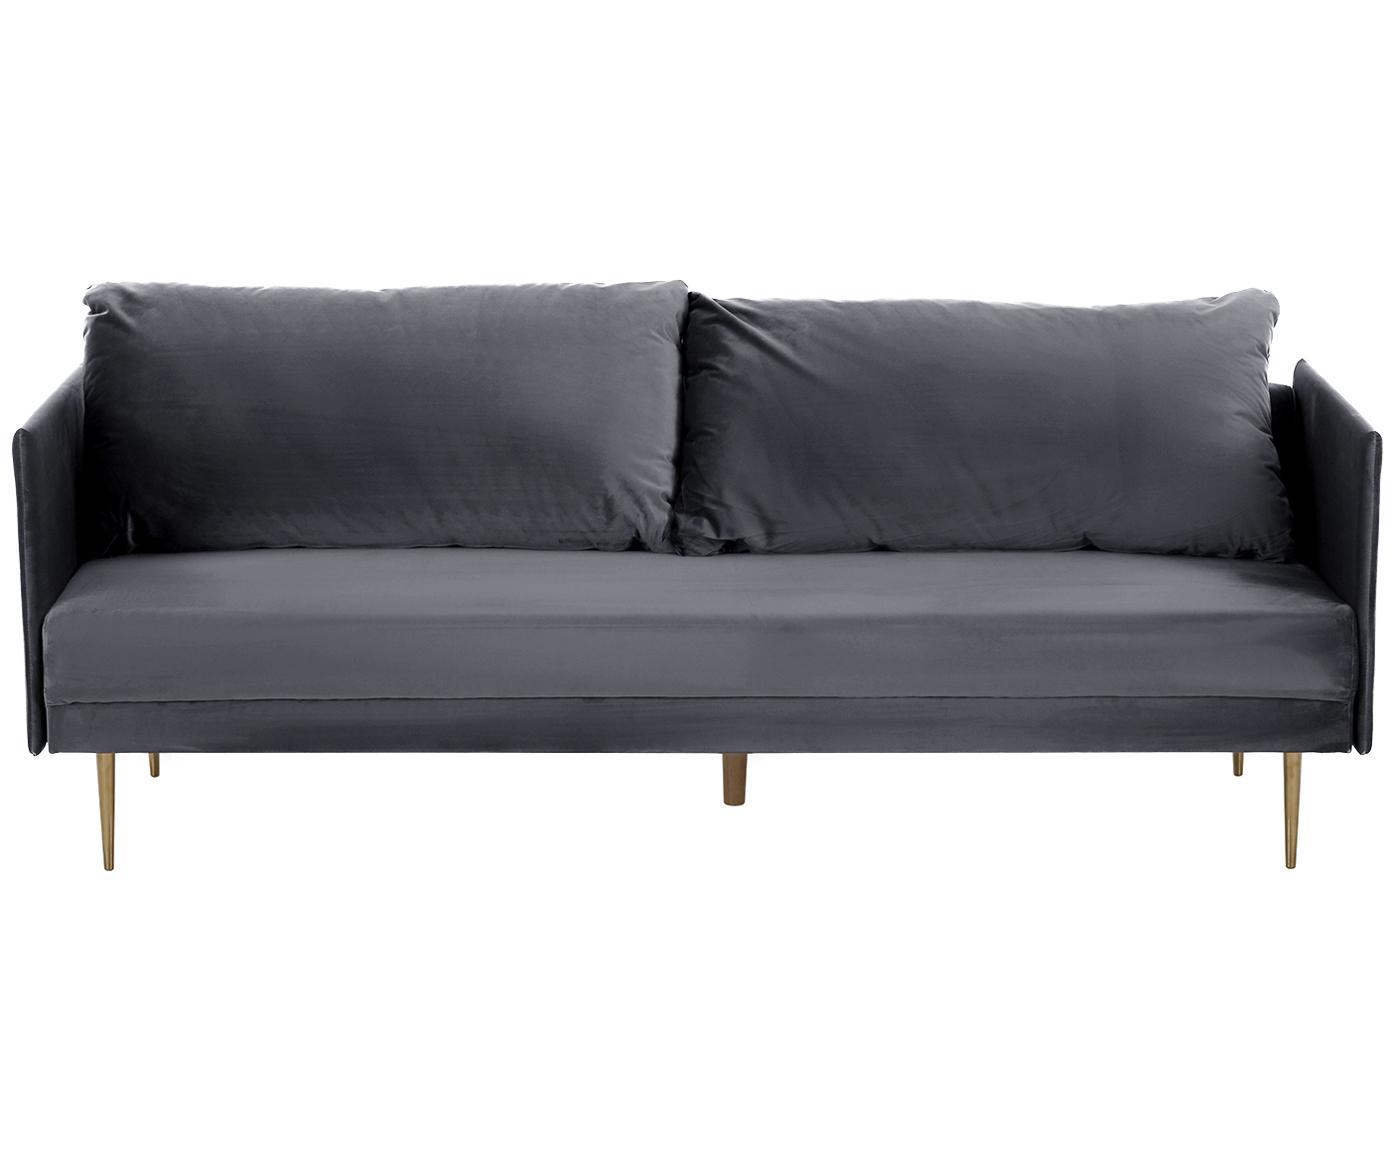 Samt-Schlafsofa Lauren, Bezug: Samt (Polyester) 28.000 S, Gestell: Kiefernholz, Samt Grau, 206 x 87 cm